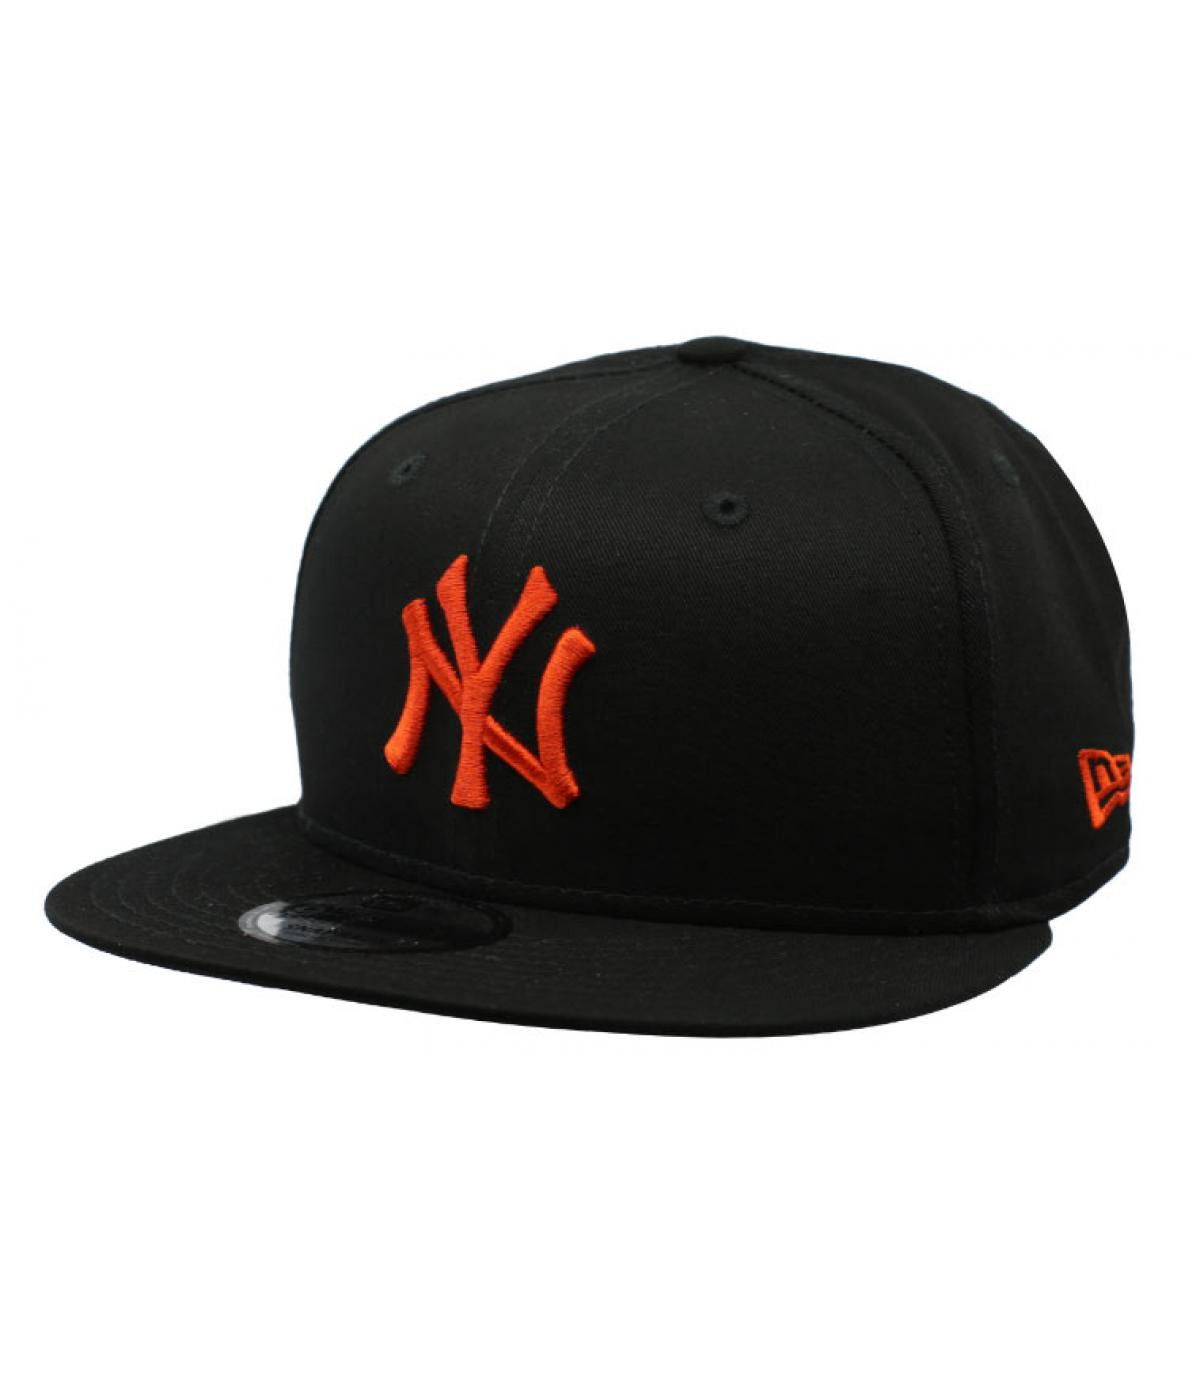 Details League Ess NY 9Fifty black orange - afbeeling 2